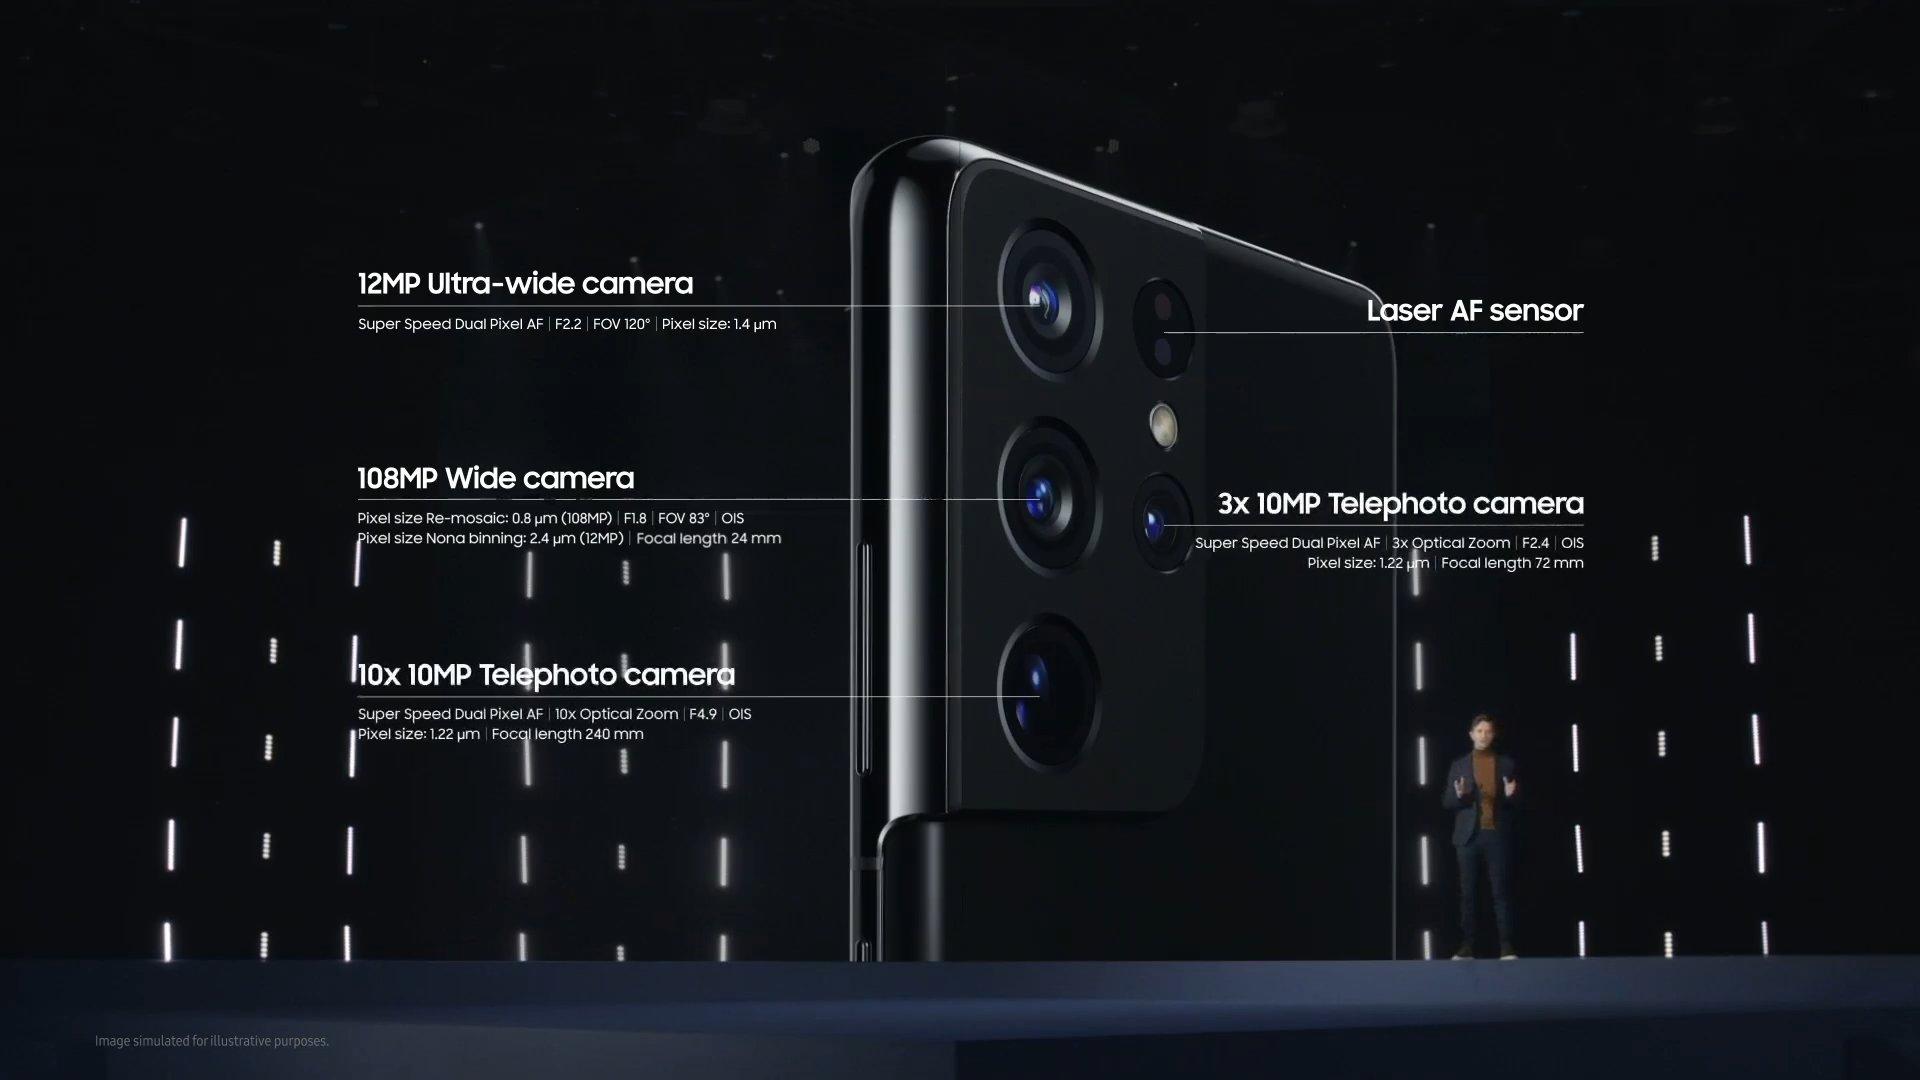 Appareil photo Galaxy S21 Ultra - Conférence Samsung 2021